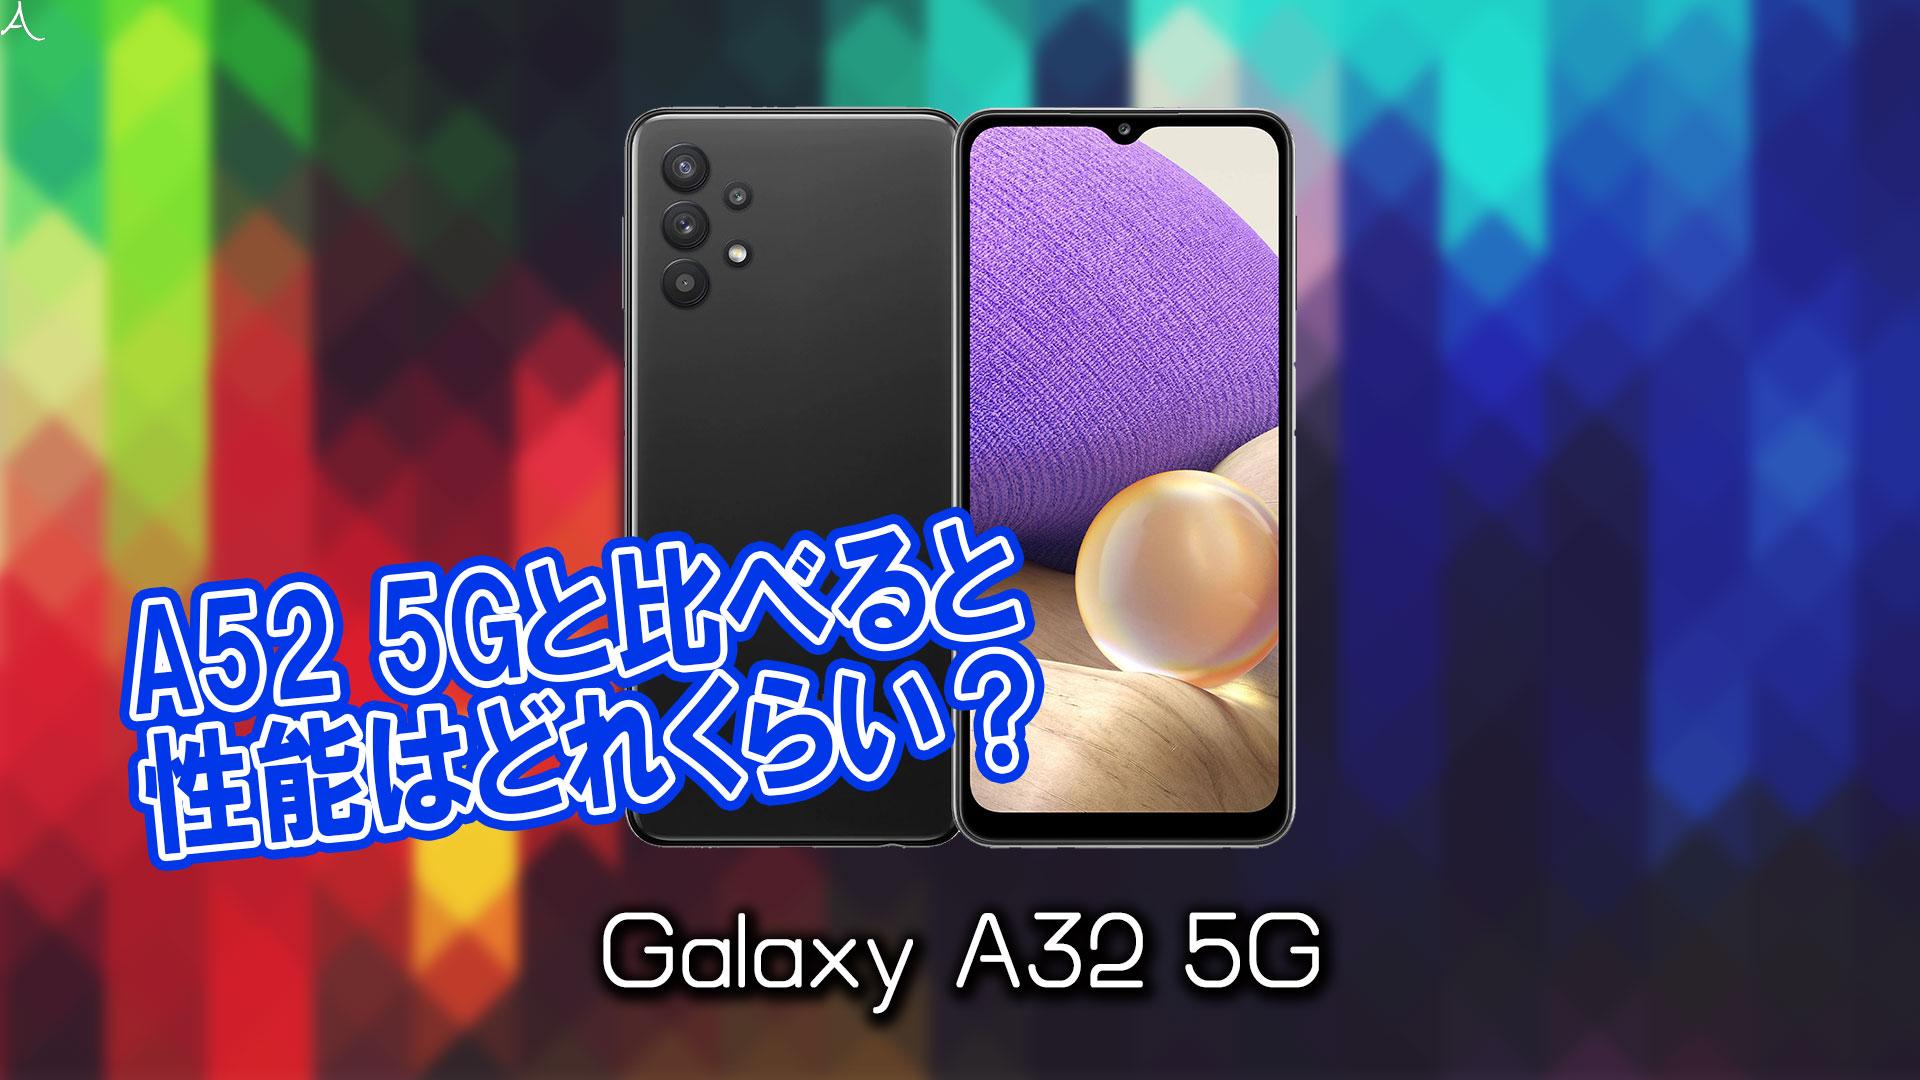 「Galaxy A32 5G」のチップセット(CPU)は何?性能をベンチマーク(Geekbench)で比較